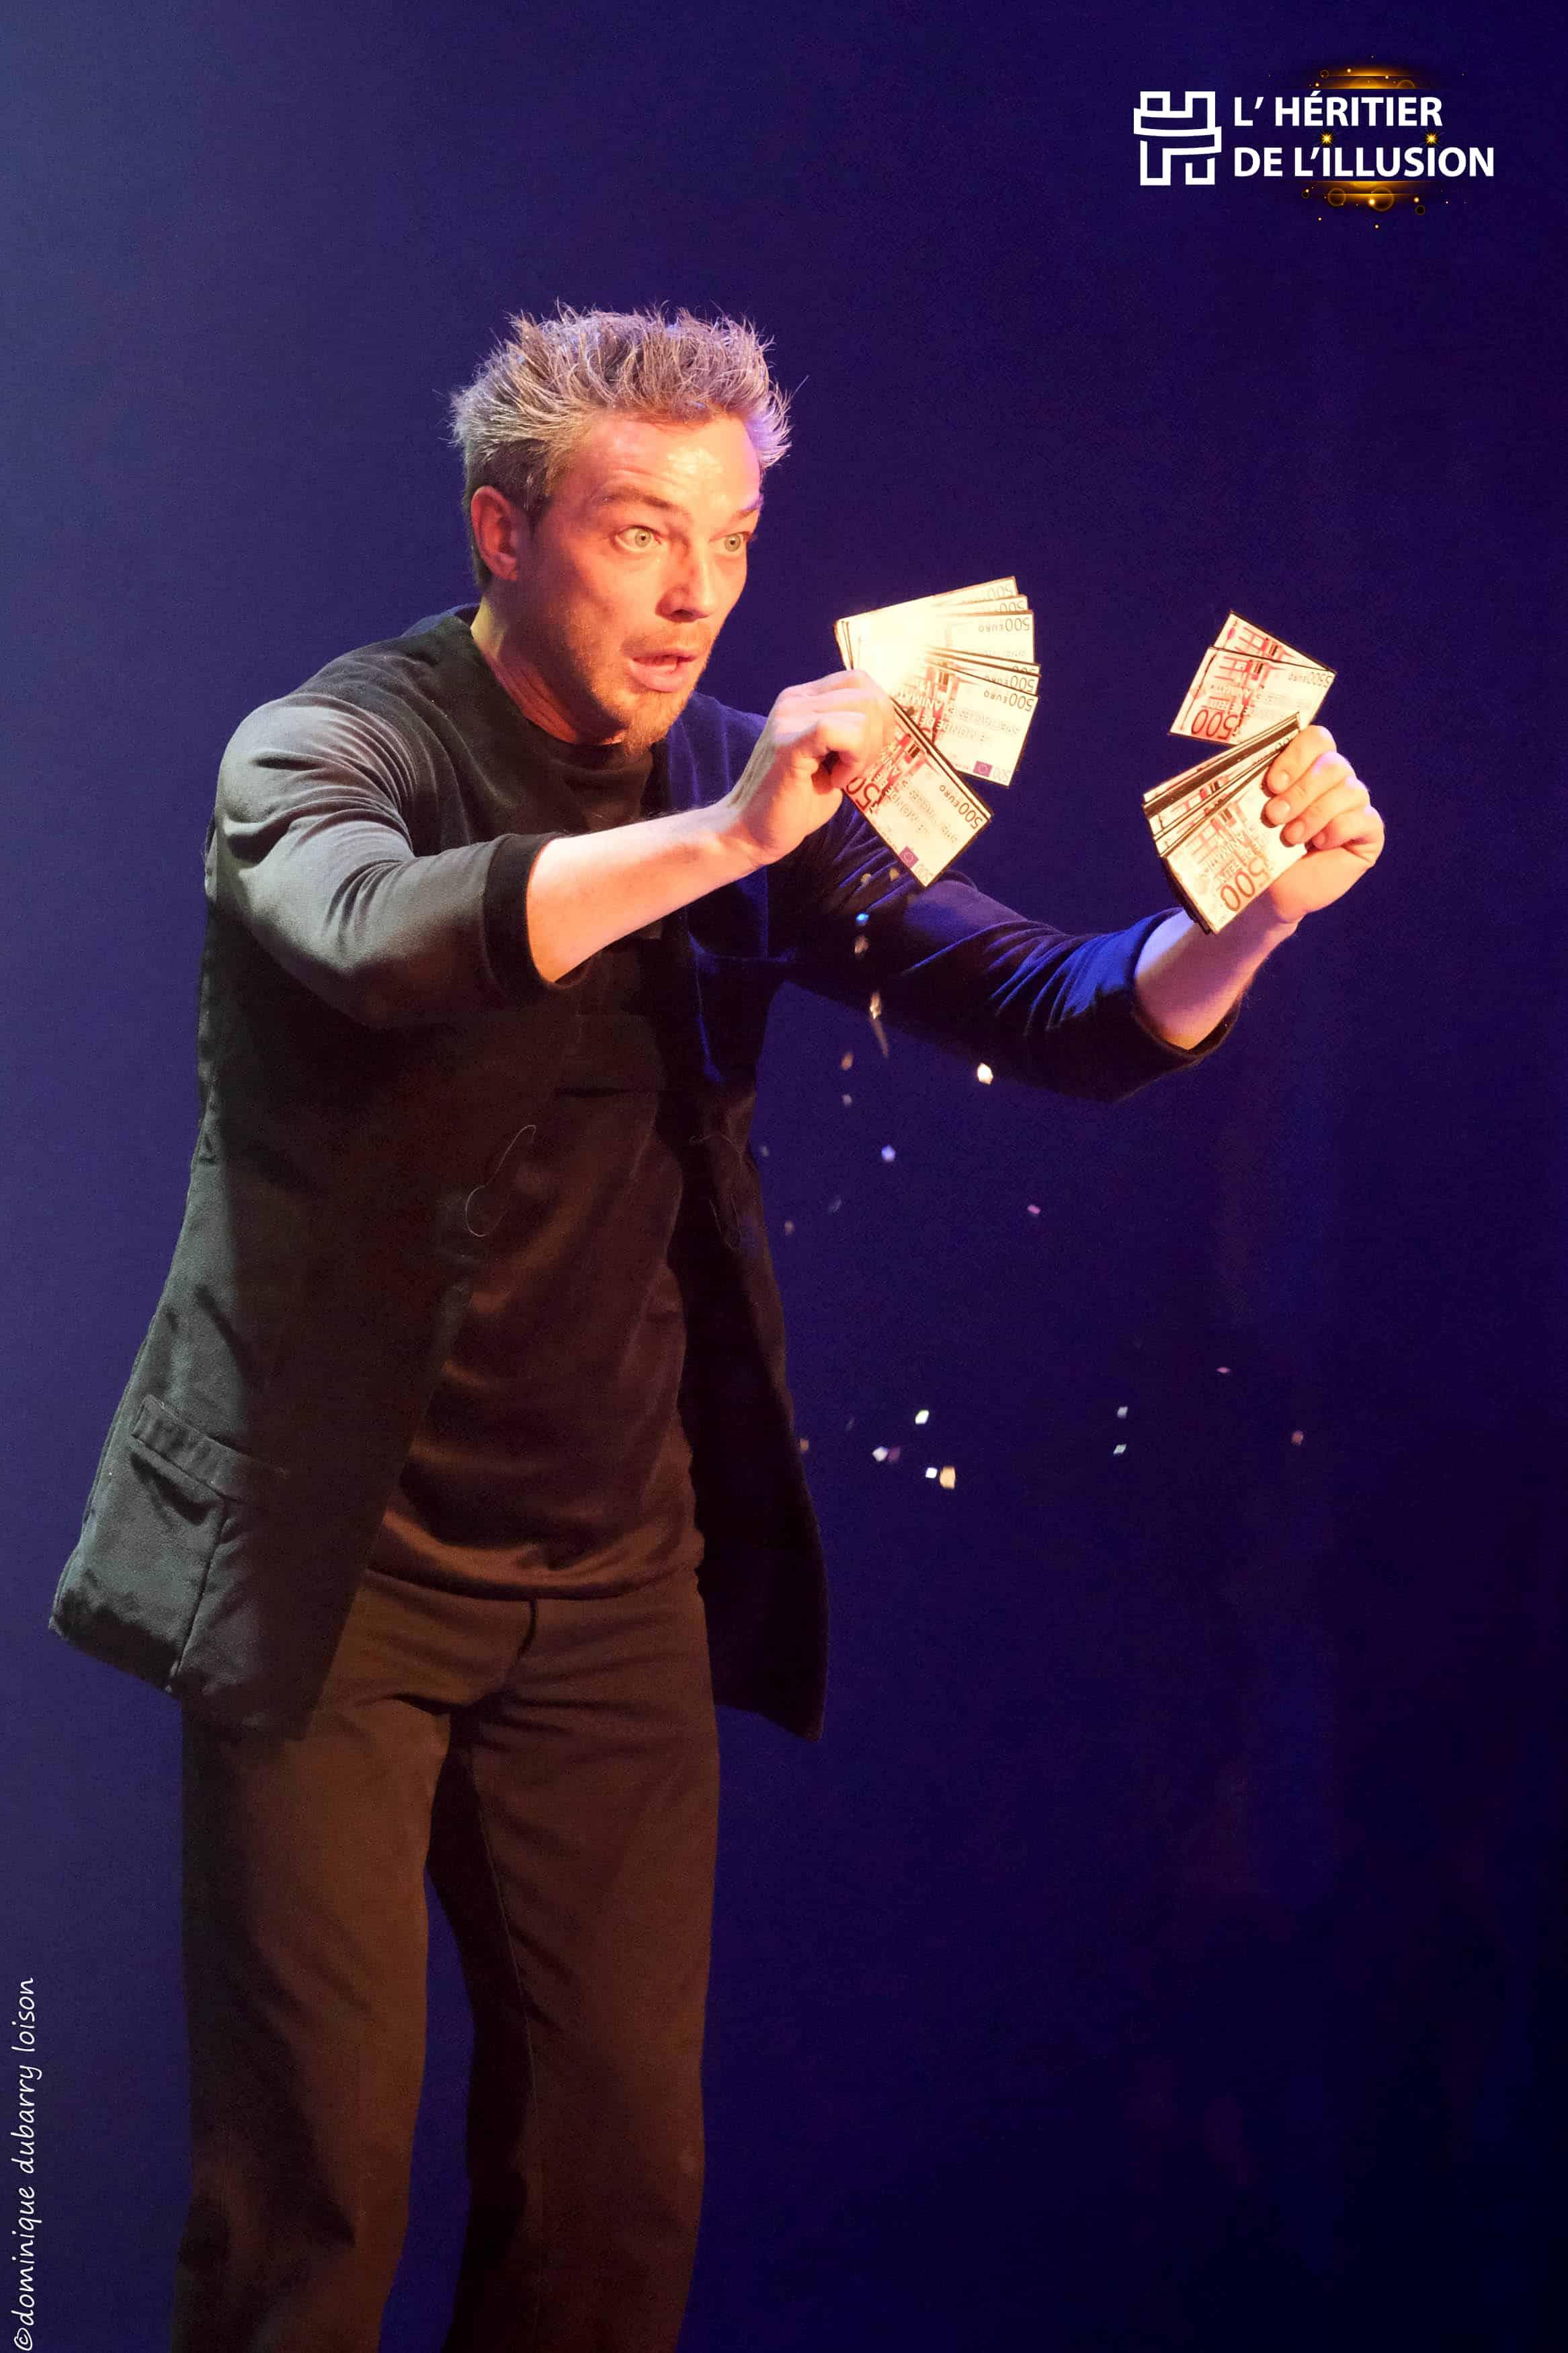 Le Monde de Felix Héritier d'Or 2019 Magic Festival